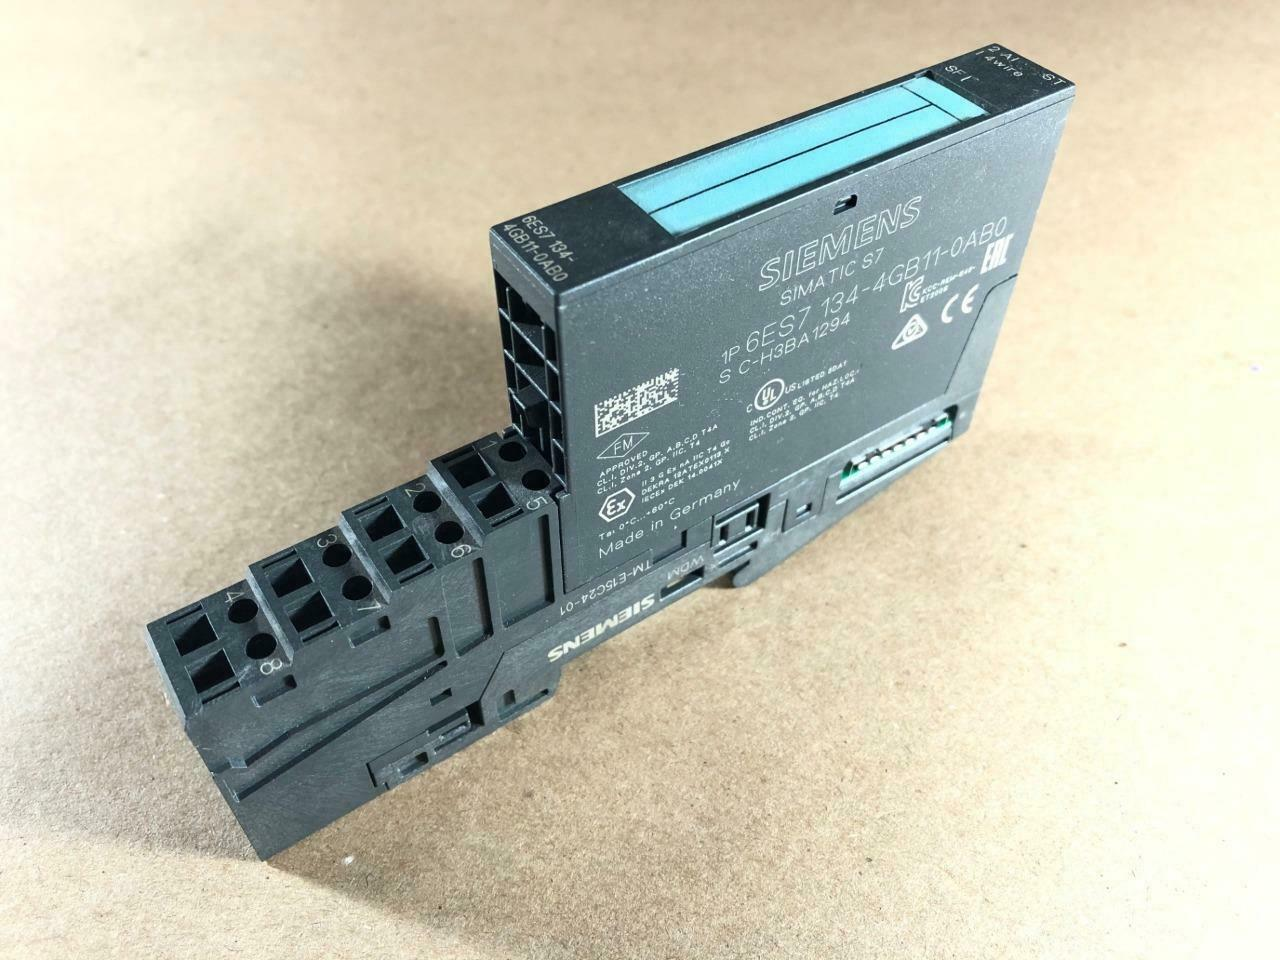 Siemens Simatic s7 6es7 134-4fb01-0ab0 //// 6es7134-4fb01-0ab0